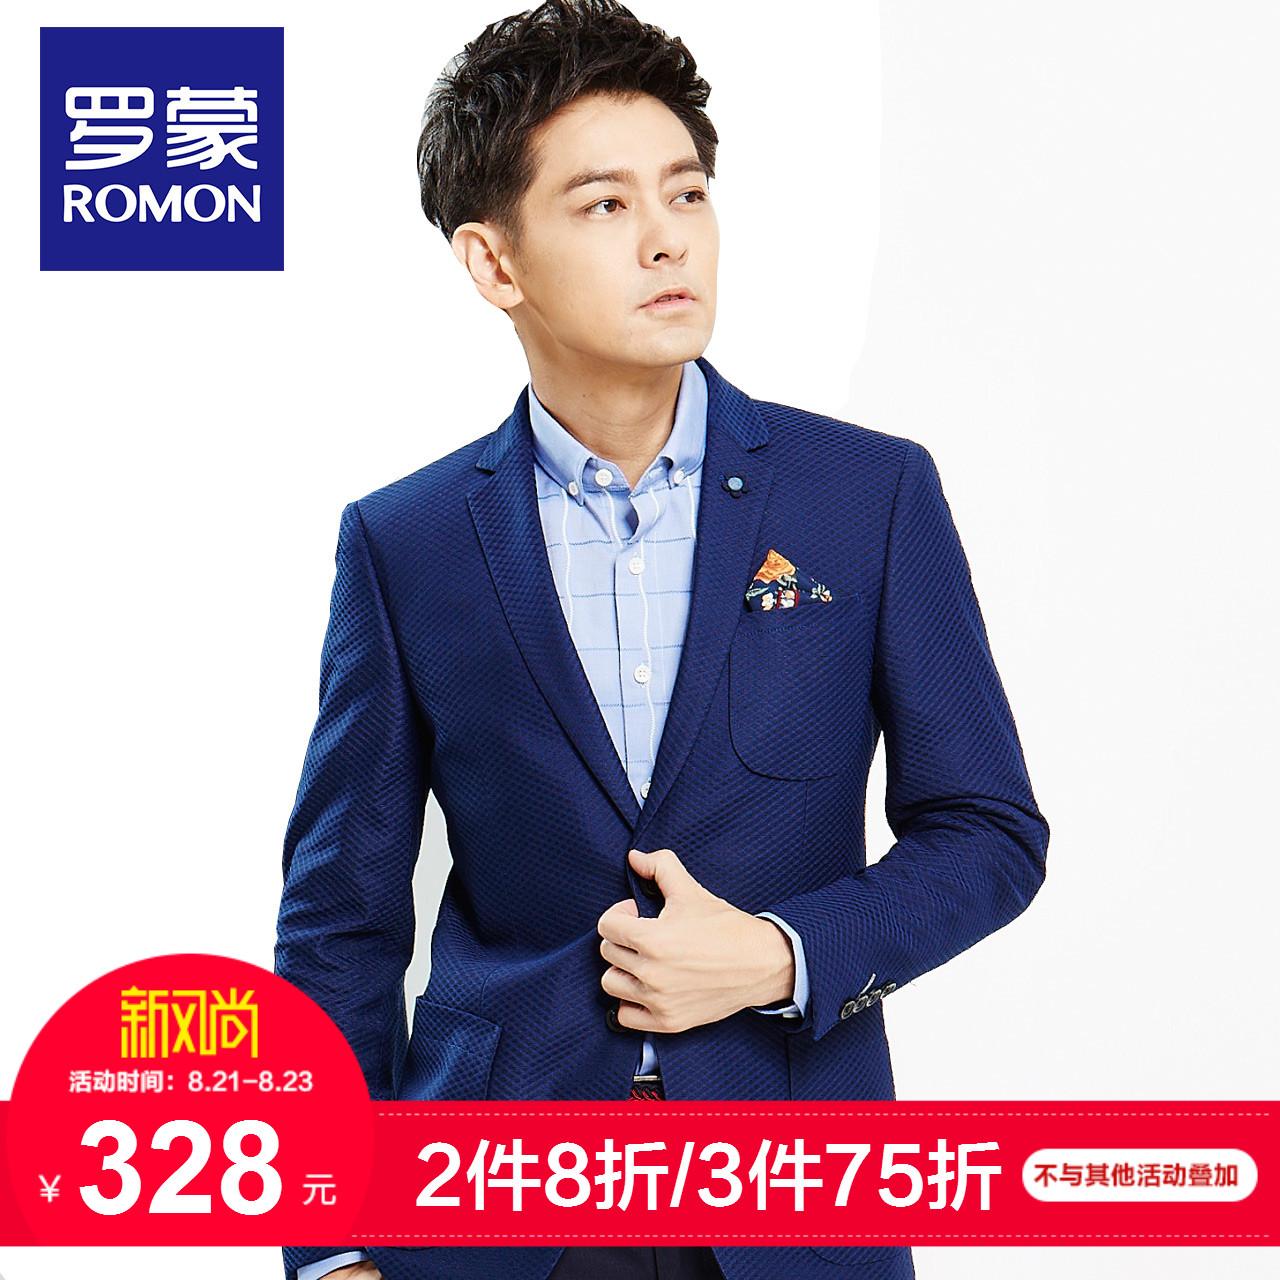 Romon/罗蒙西装男士单西外套春季新款商务休闲西服青年修身小西装